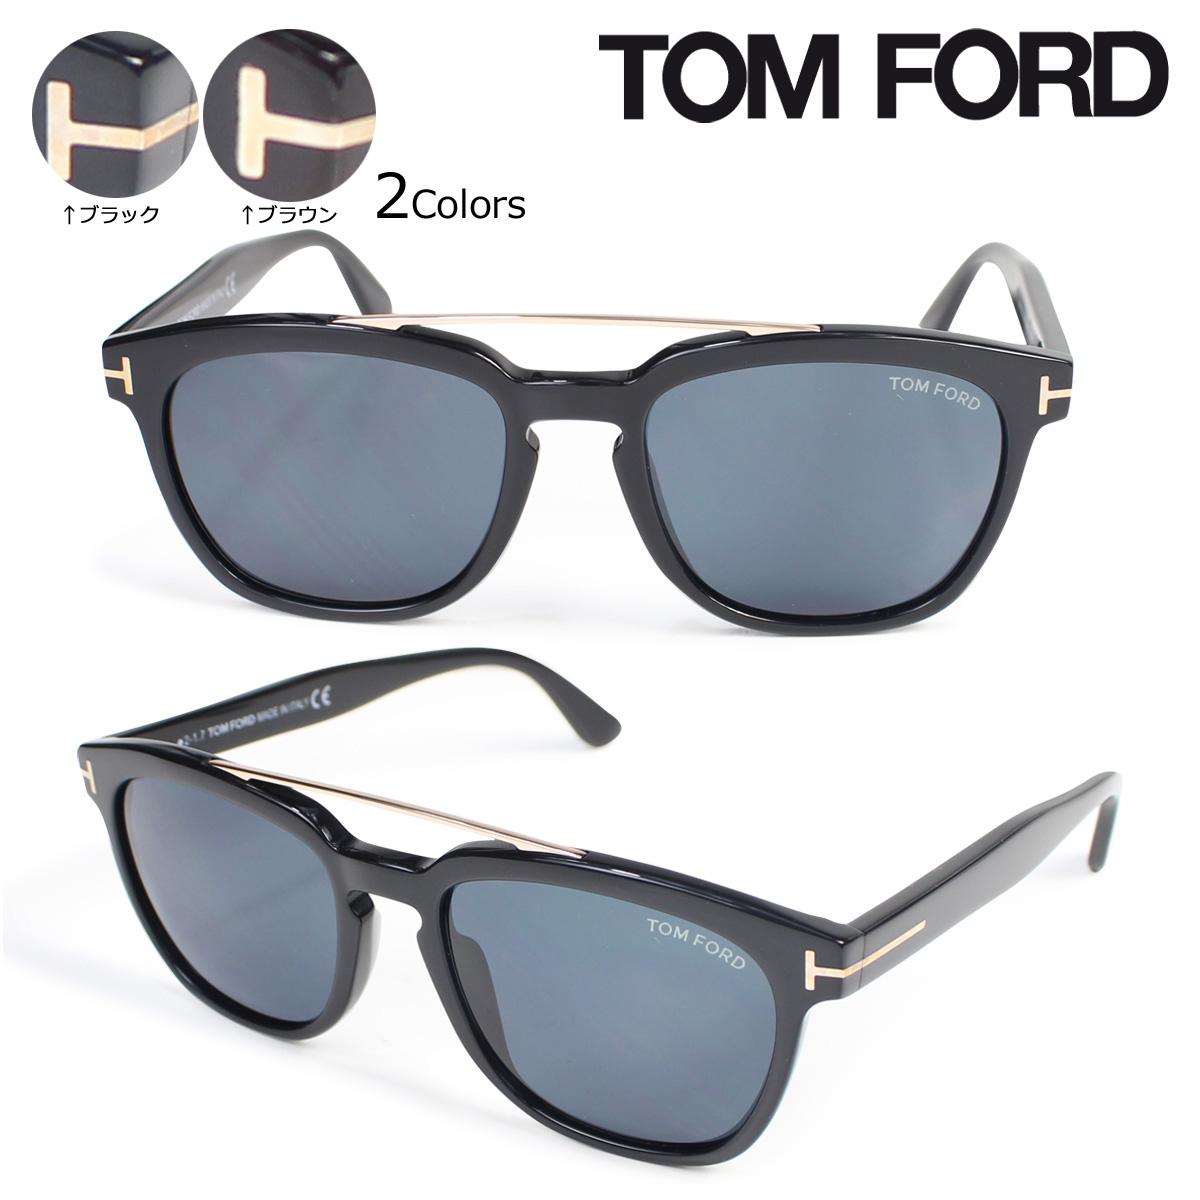 TOM FORD トムフォード サングラス メガネ メンズ レディース アイウェア FT0516 HOLT SUNGLASSES 2カラー [177]